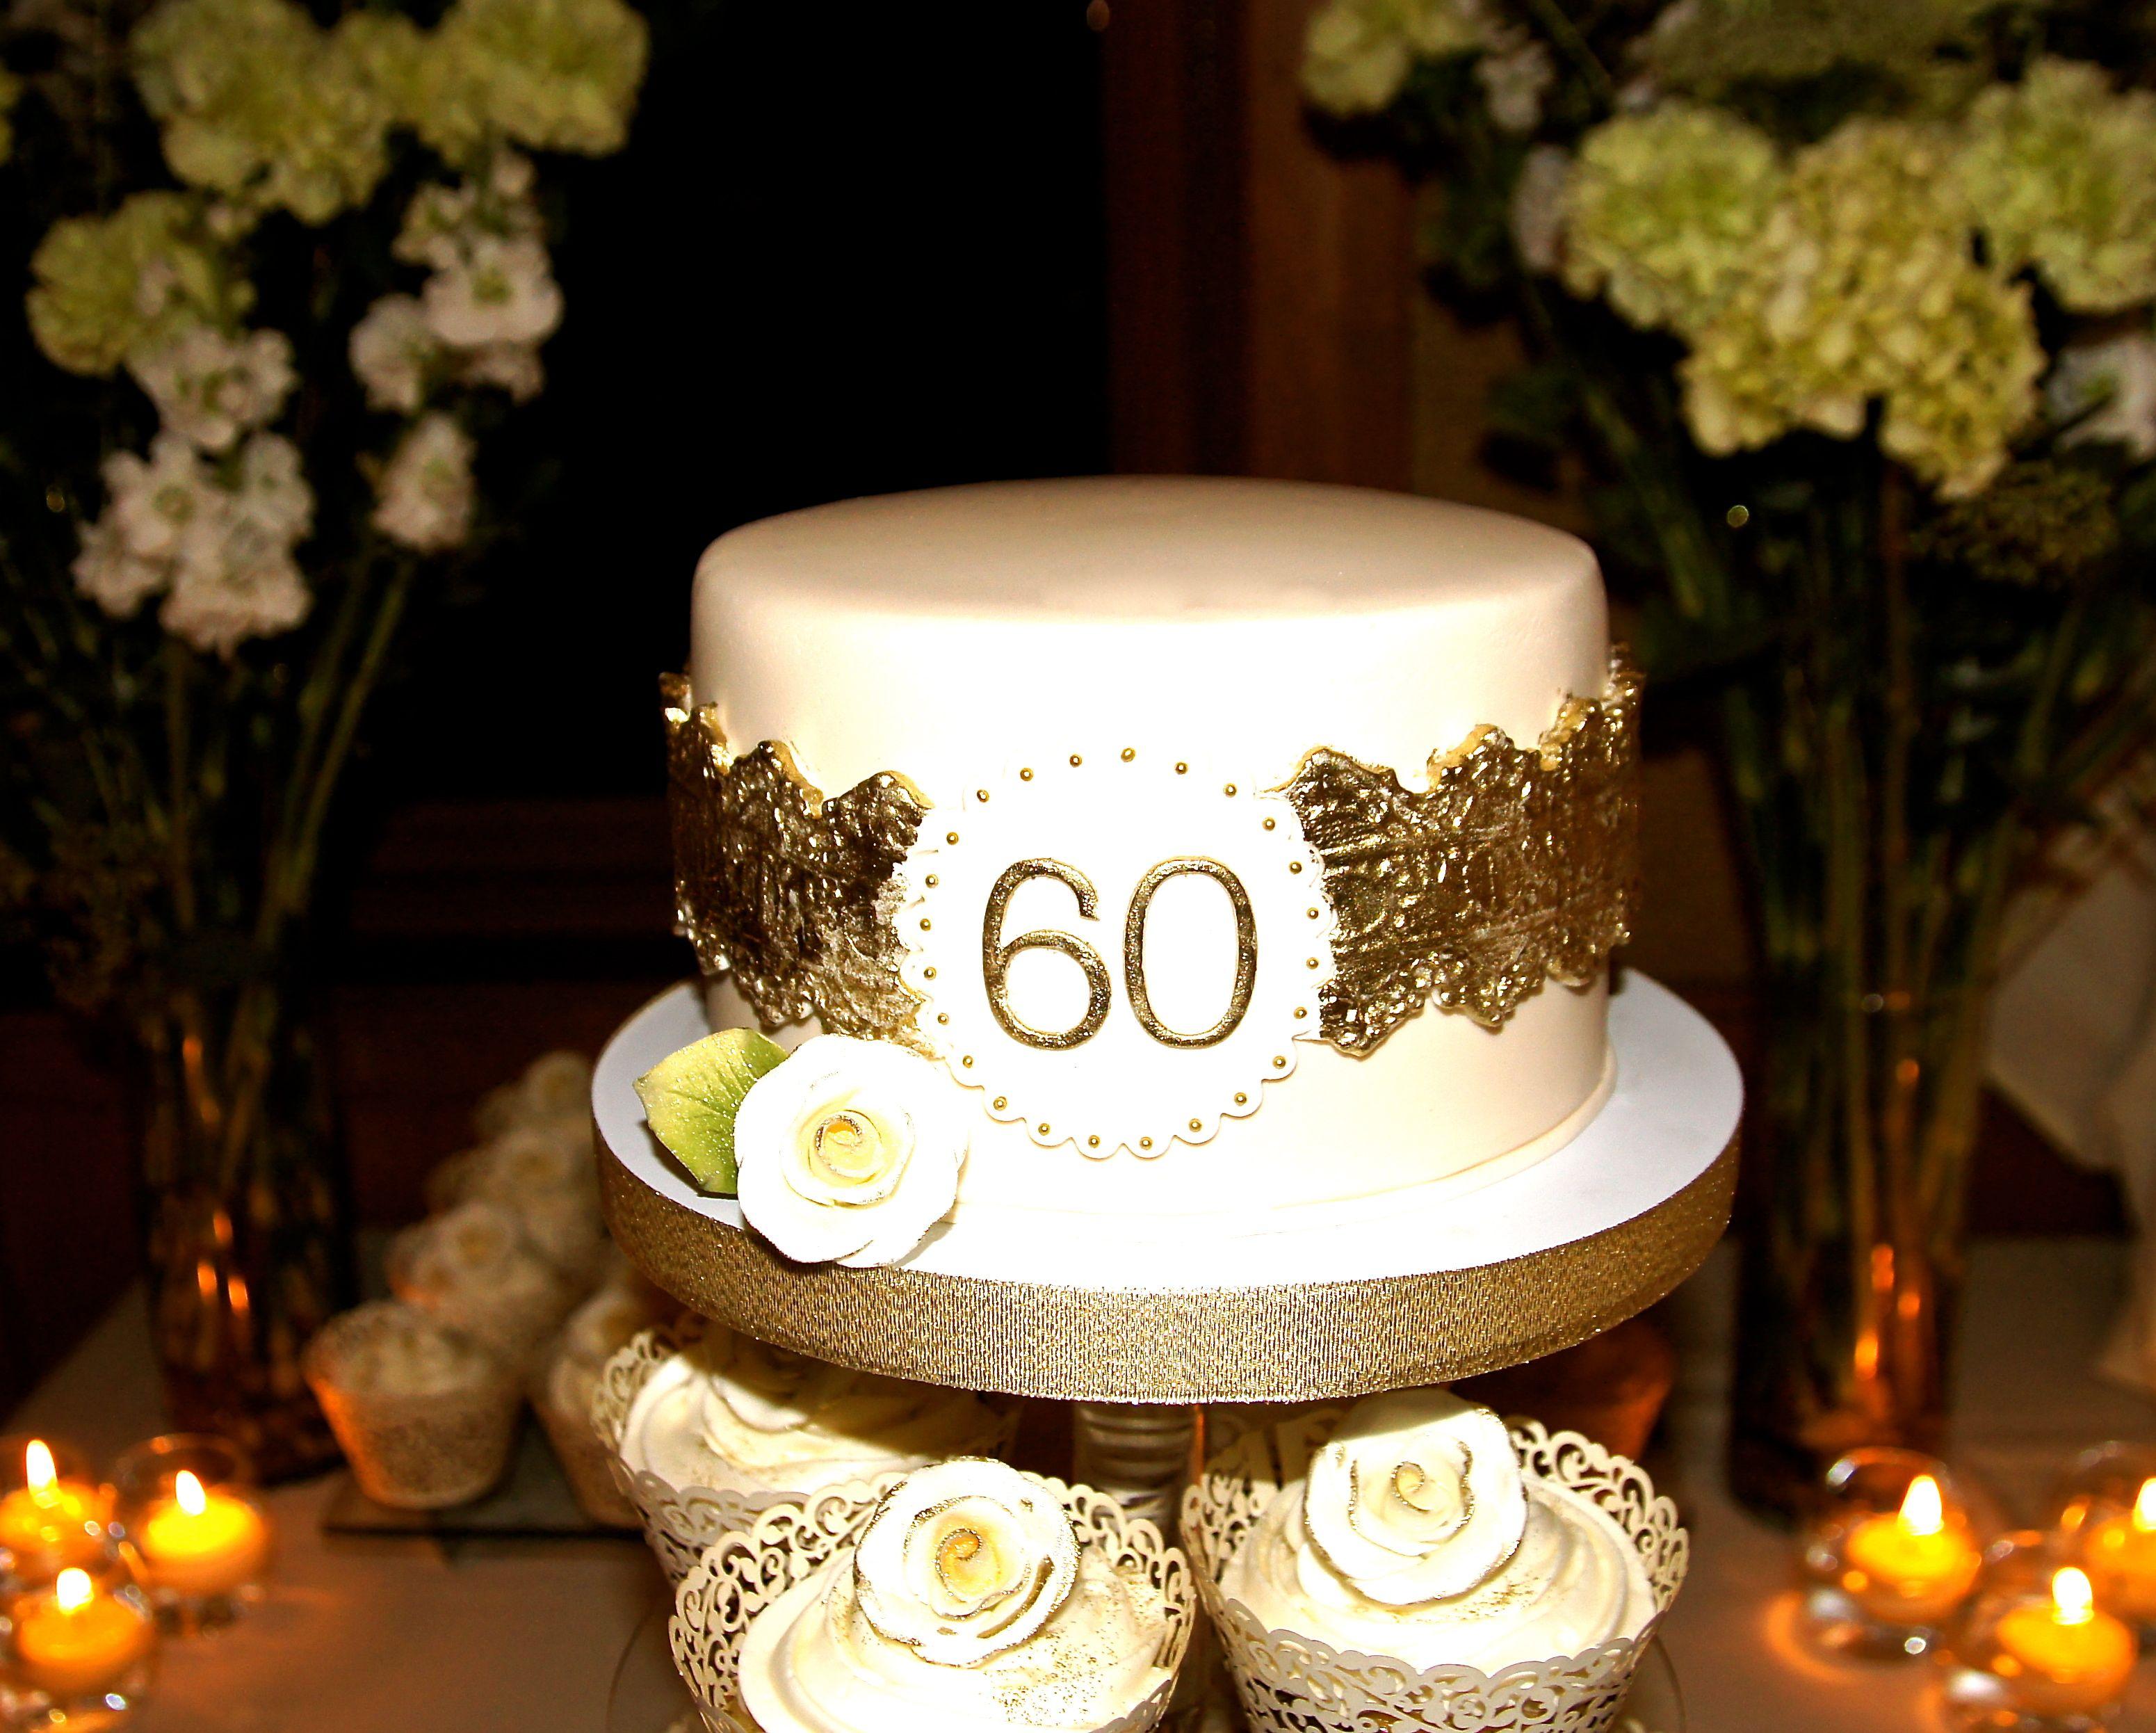 60 Years Birthday Cake Birthday cake, Party cakes, Cake